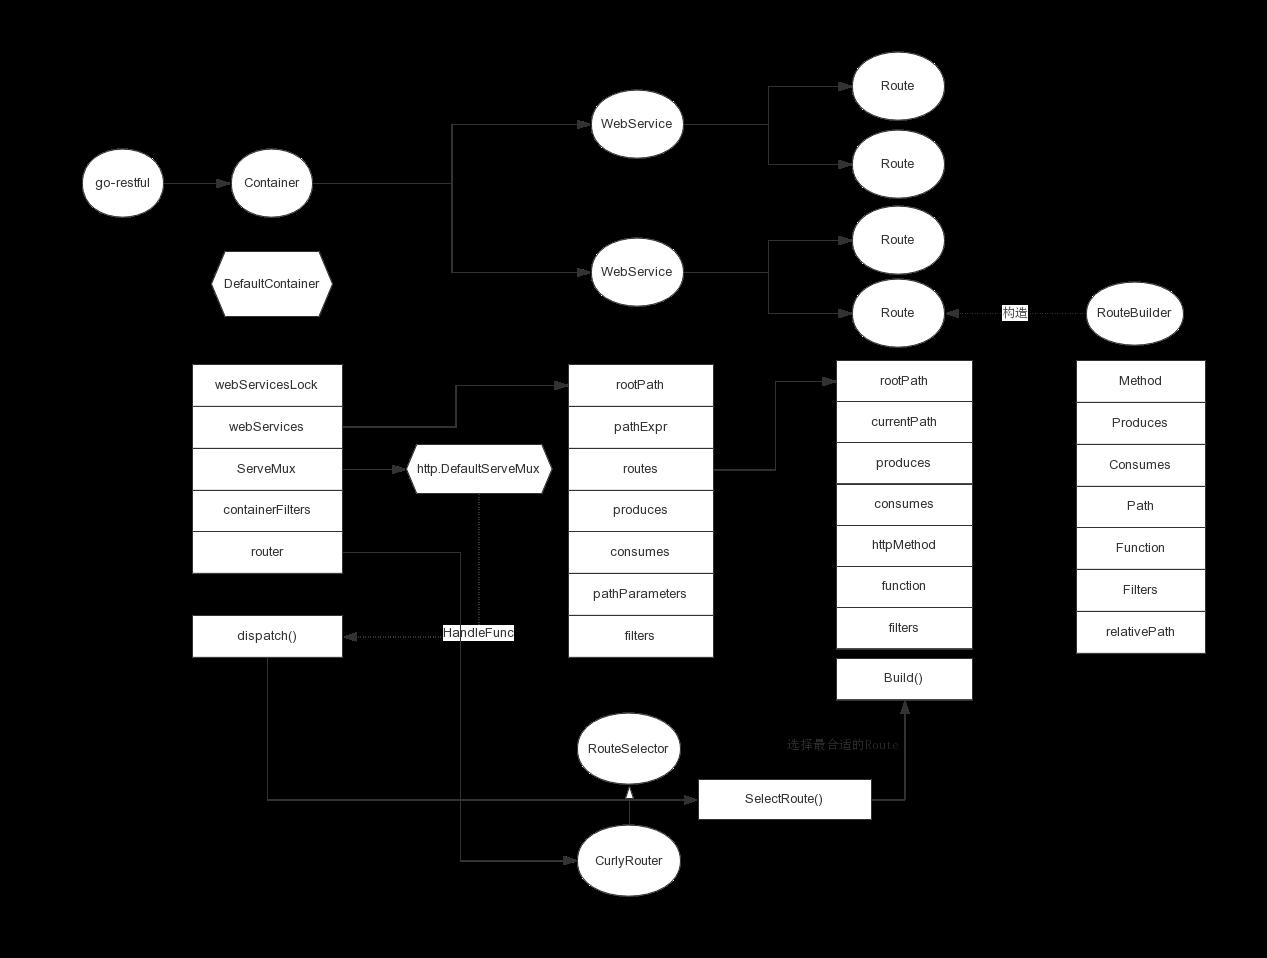 go-restful核心数据结构